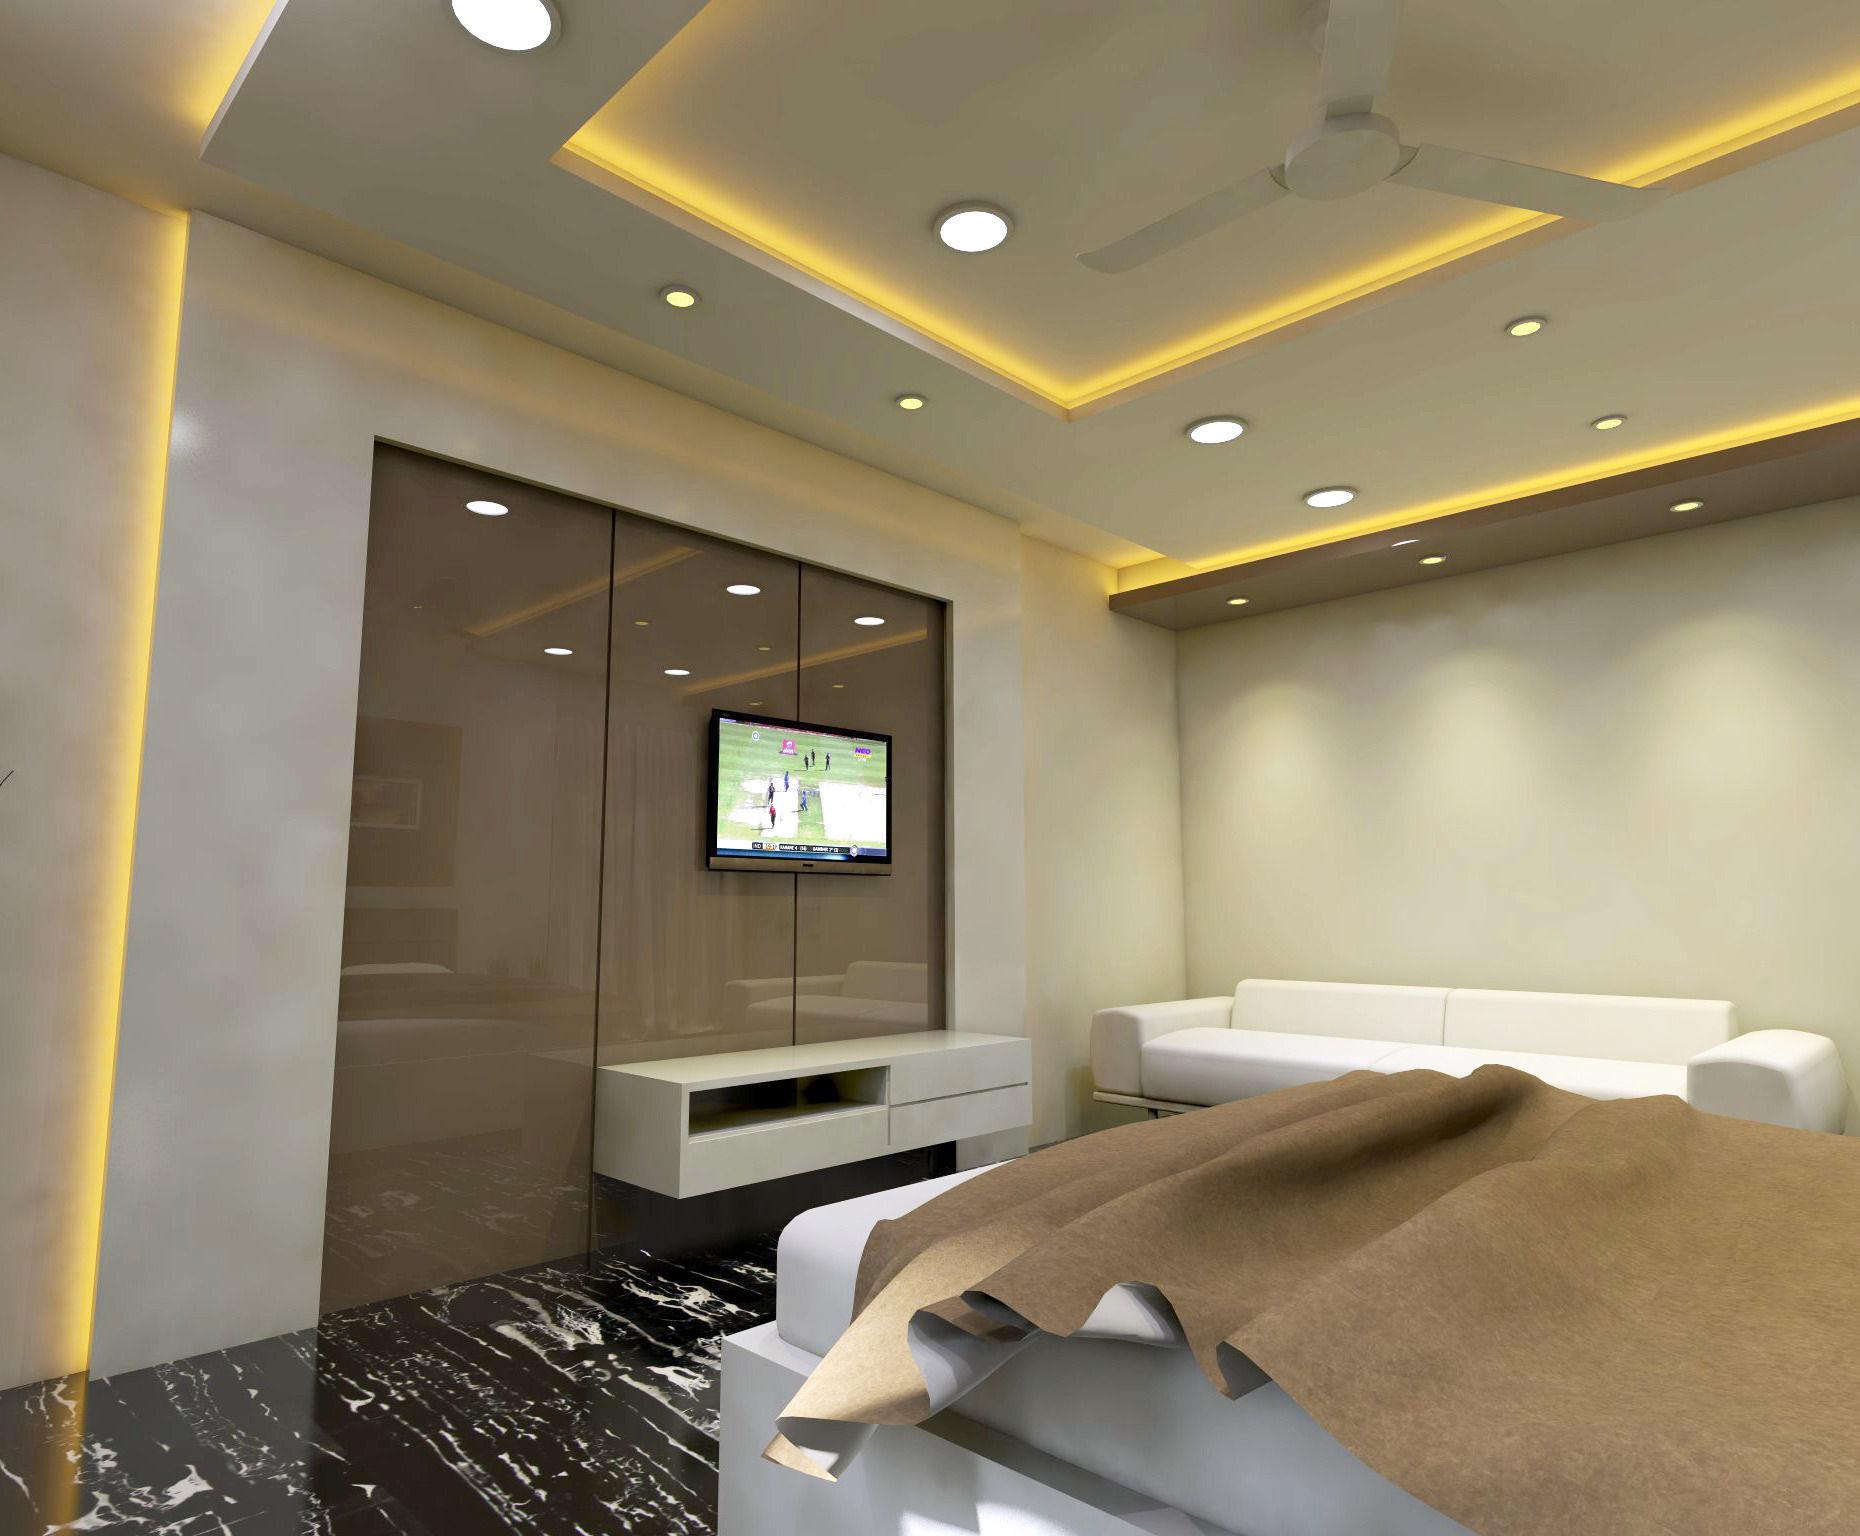 Modern Bedroom Interior Vray Rendered 3D Model SKP ... on Model Bedroom Interior Design  id=73688